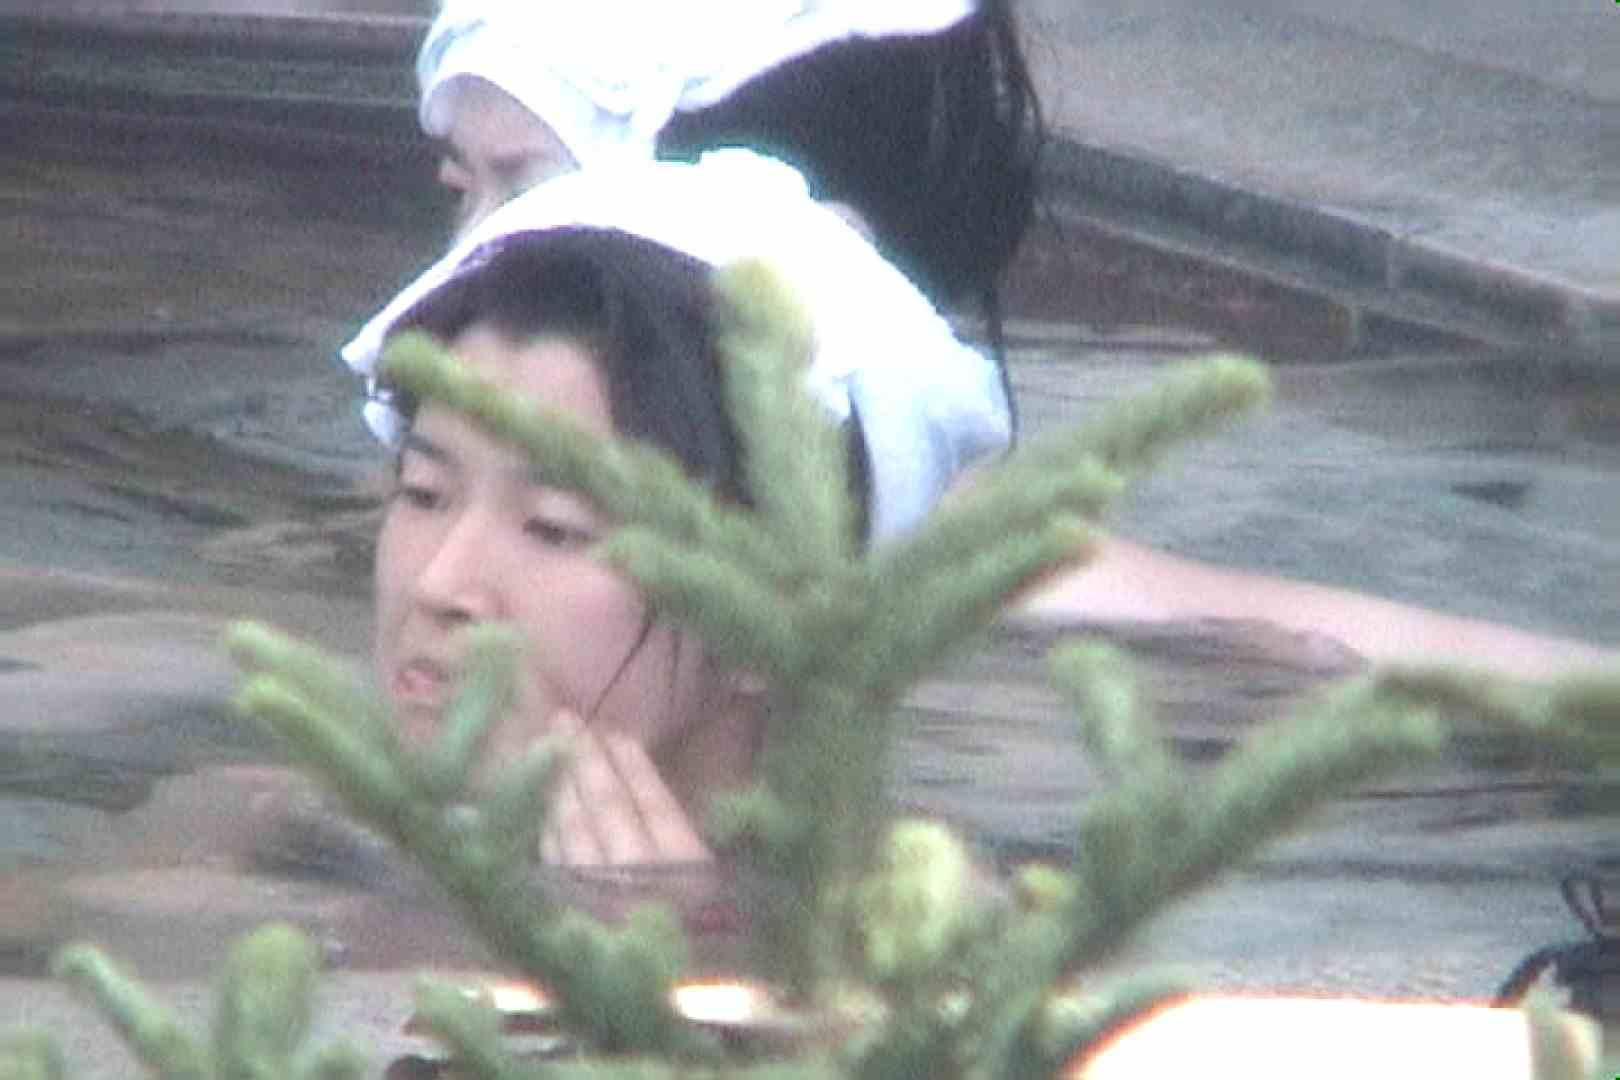 Aquaな露天風呂Vol.80【VIP限定】 盗撮 | HなOL  66pic 64